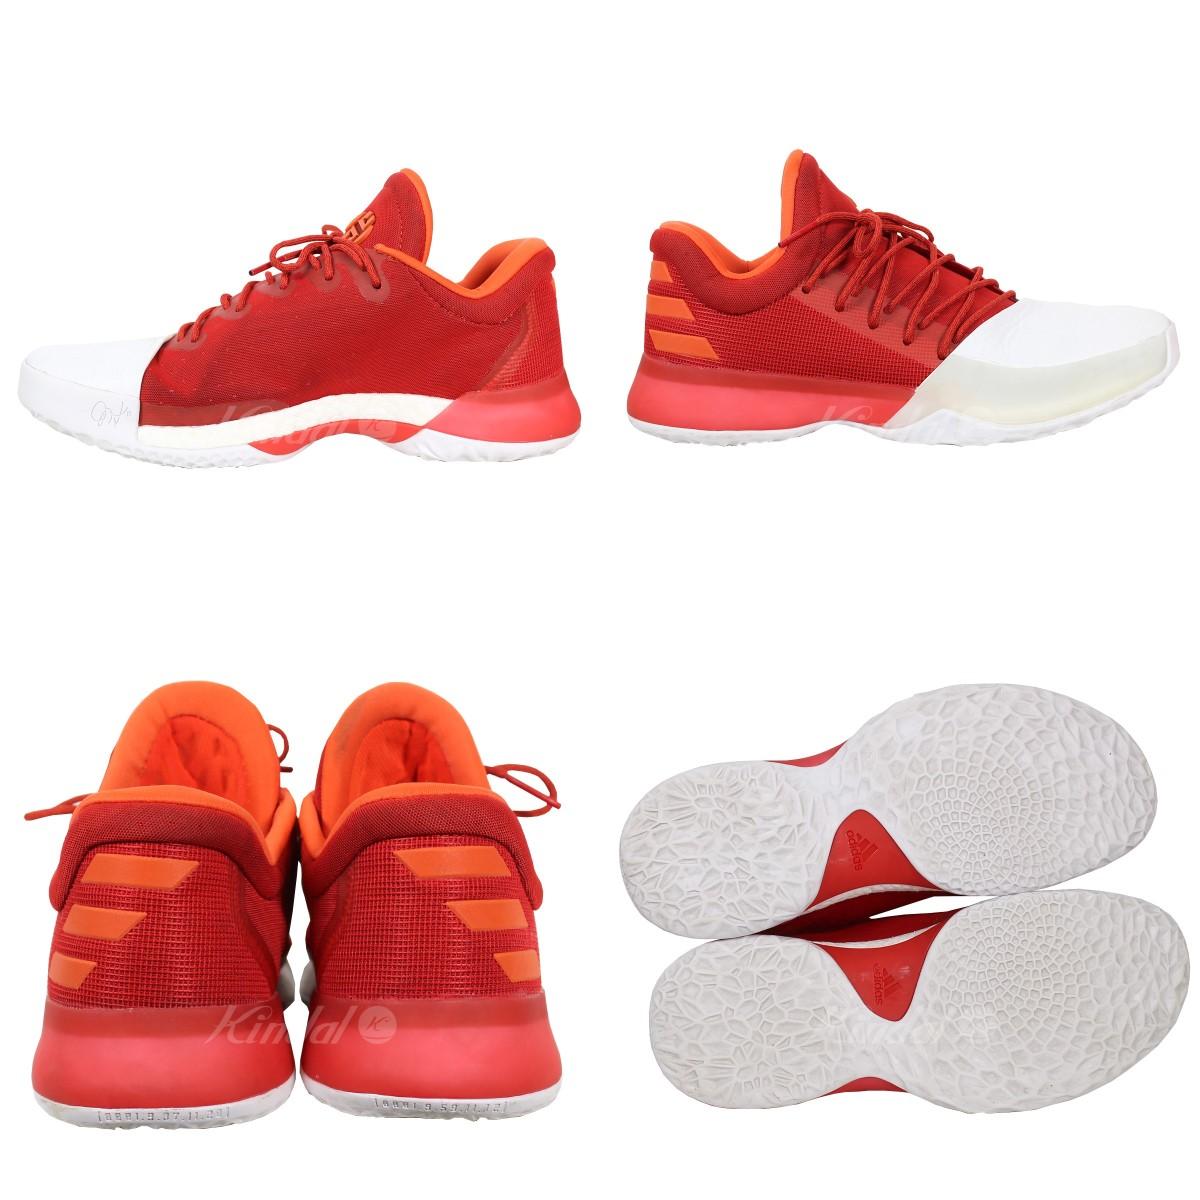 8c6366052b11 ... best price adidas j. harden vol. 1 crazy x james arthur harden model  basket